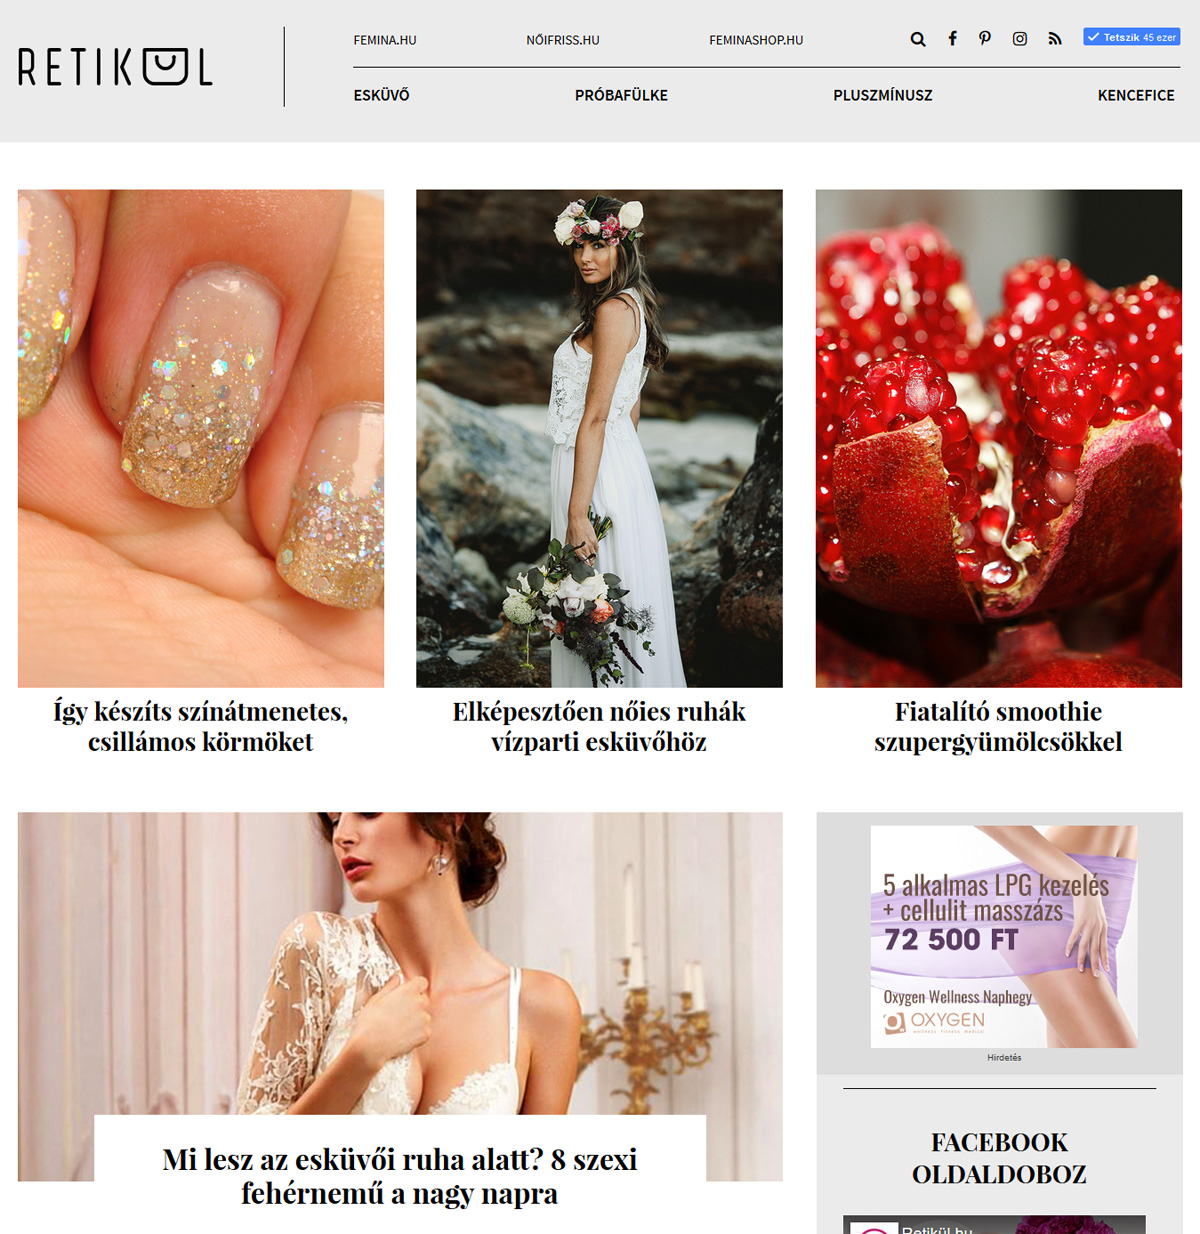 retikul_nyito_uj_2_1.jpg